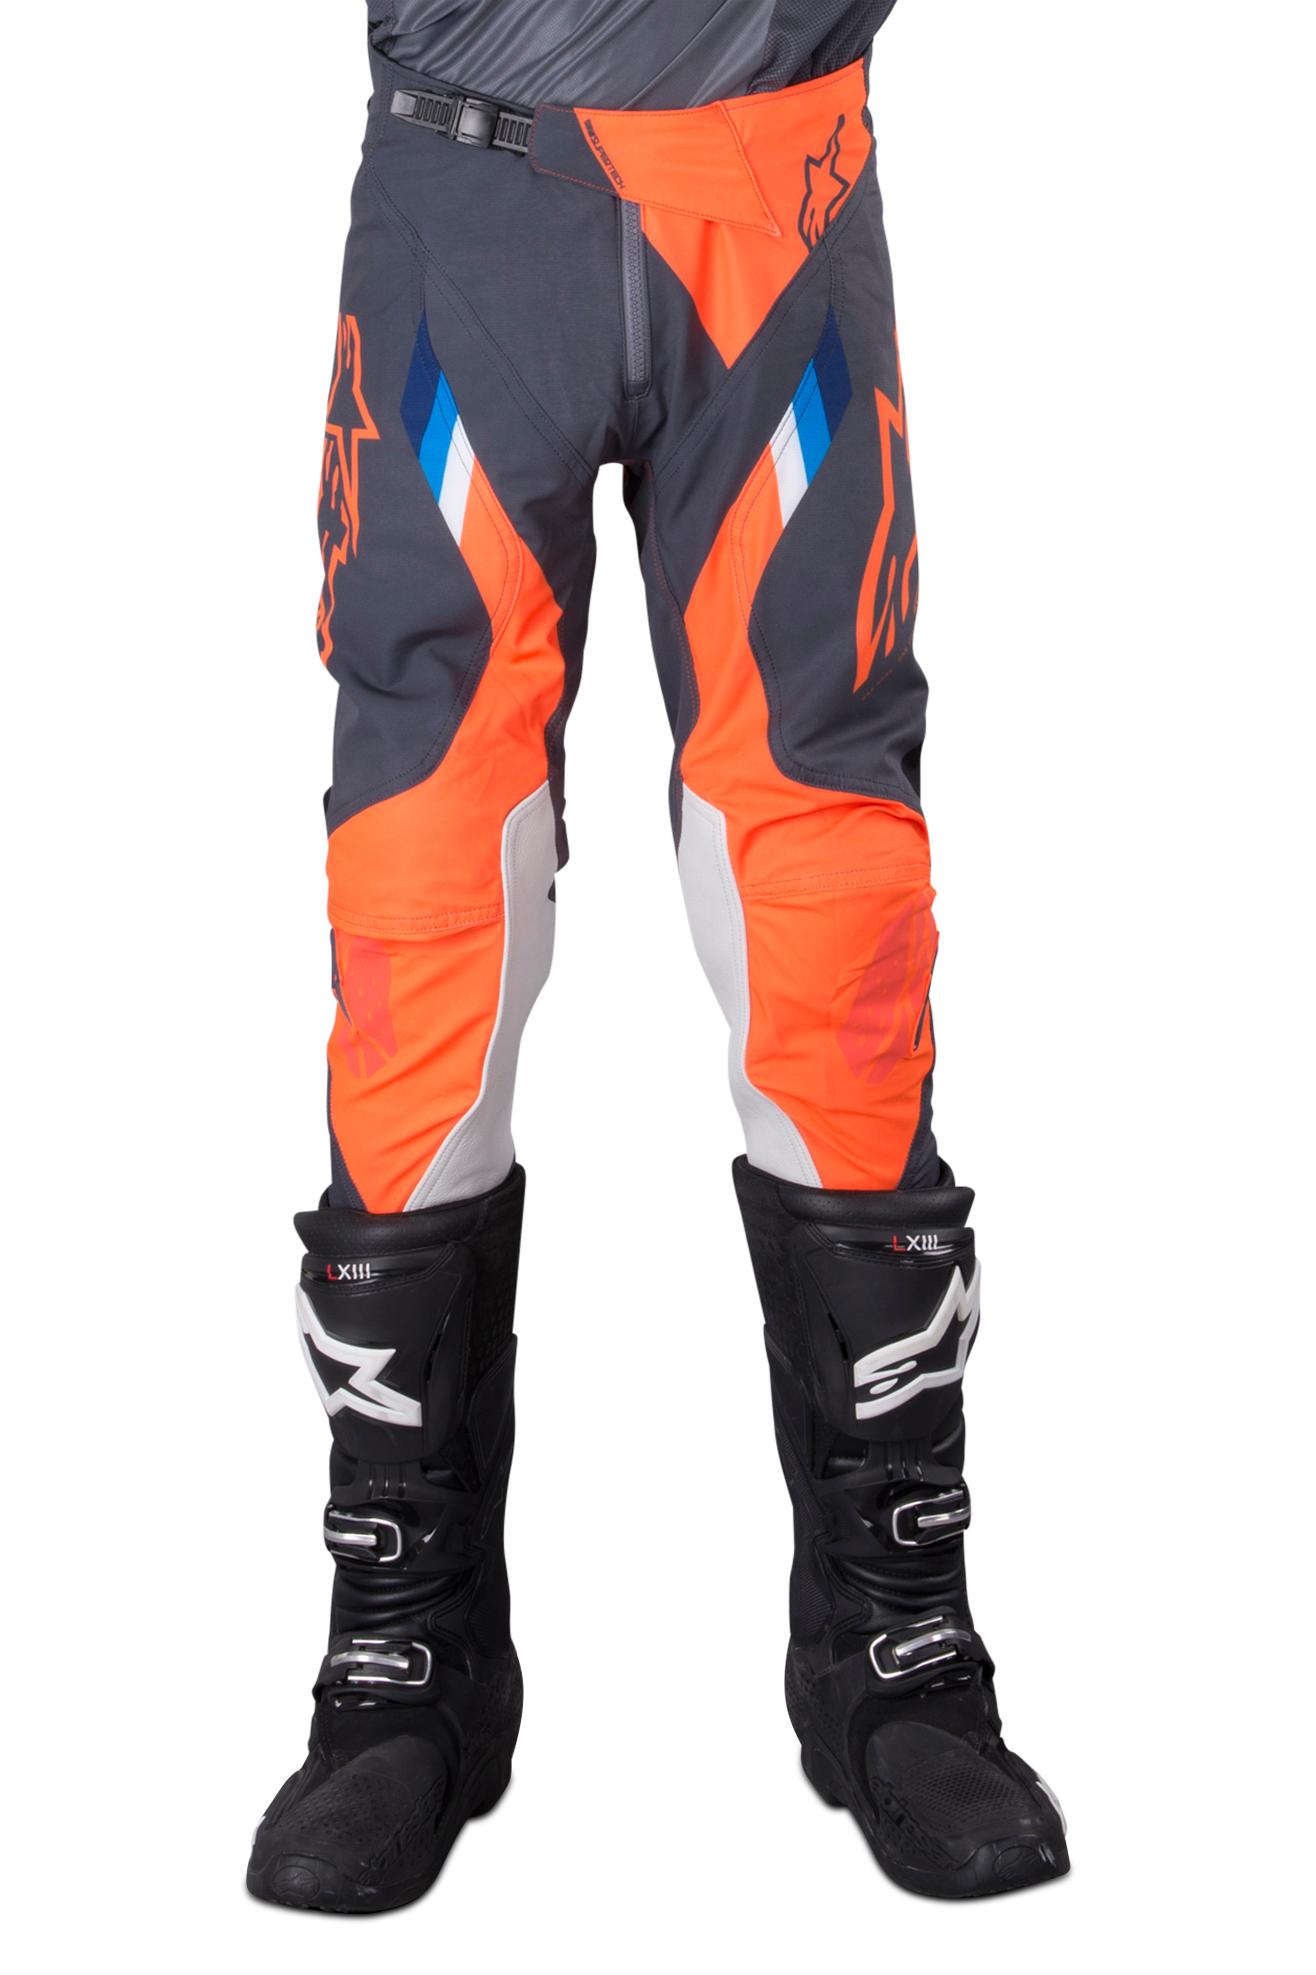 Alpinestars Pantalon Cross Alpinestars Supertech - Anthracite et Orange fluo